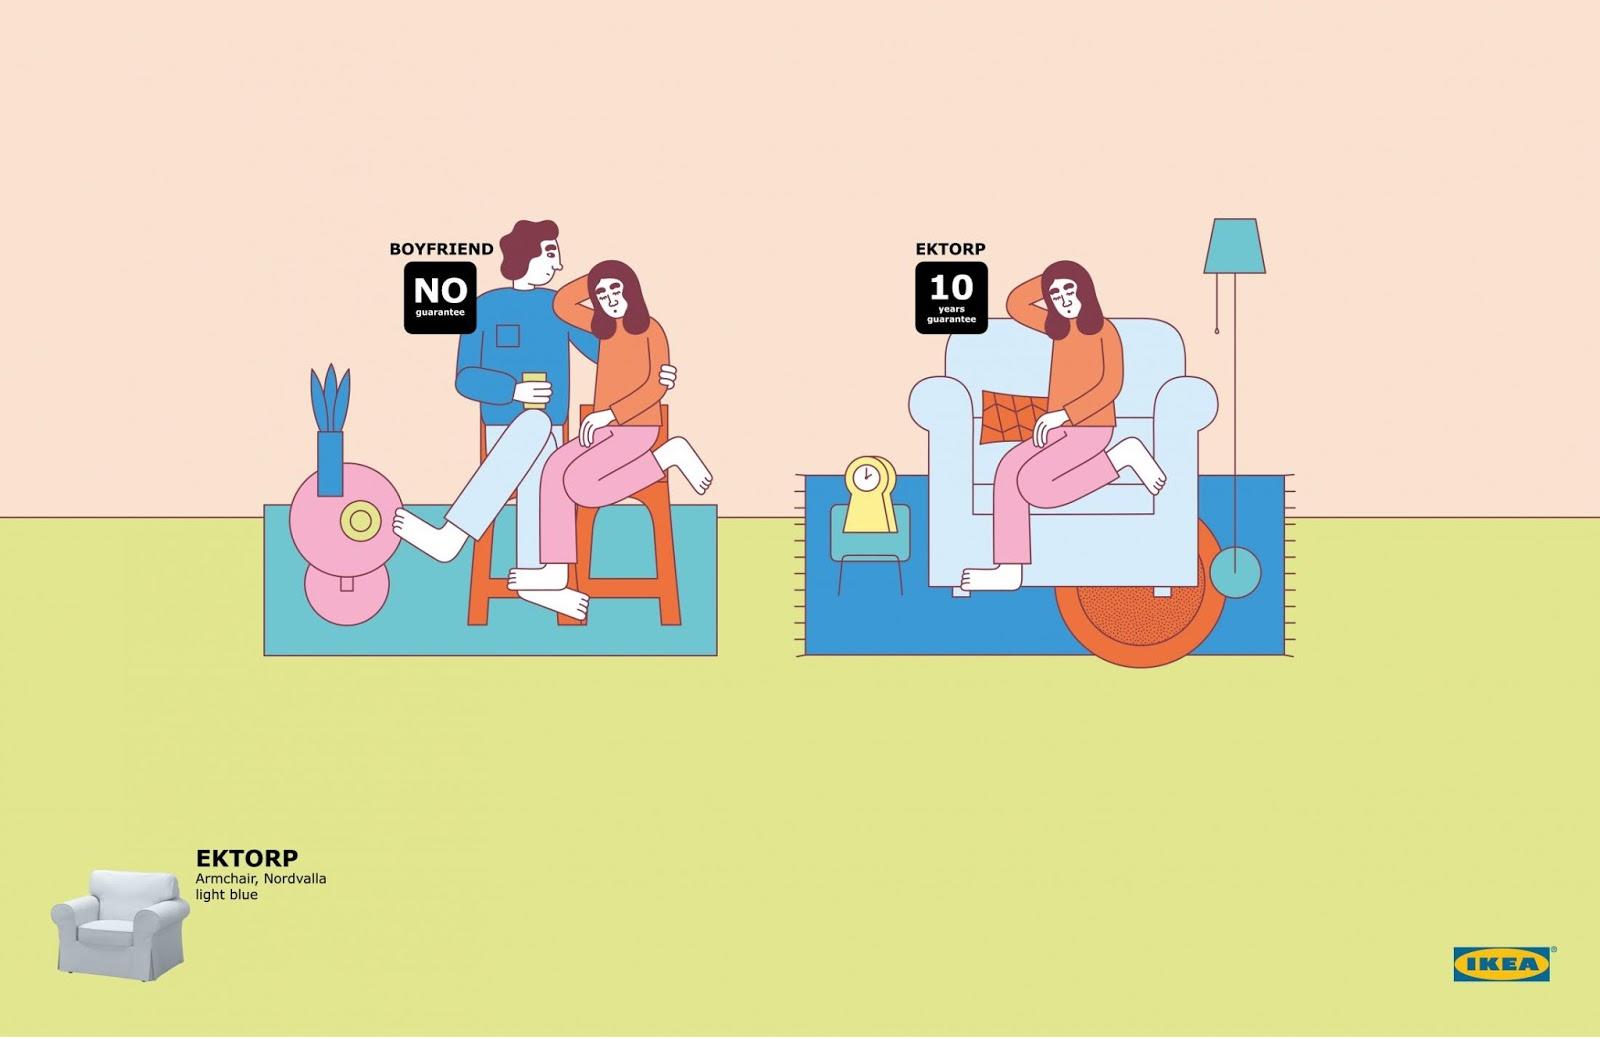 varietats ikea advertising. Black Bedroom Furniture Sets. Home Design Ideas